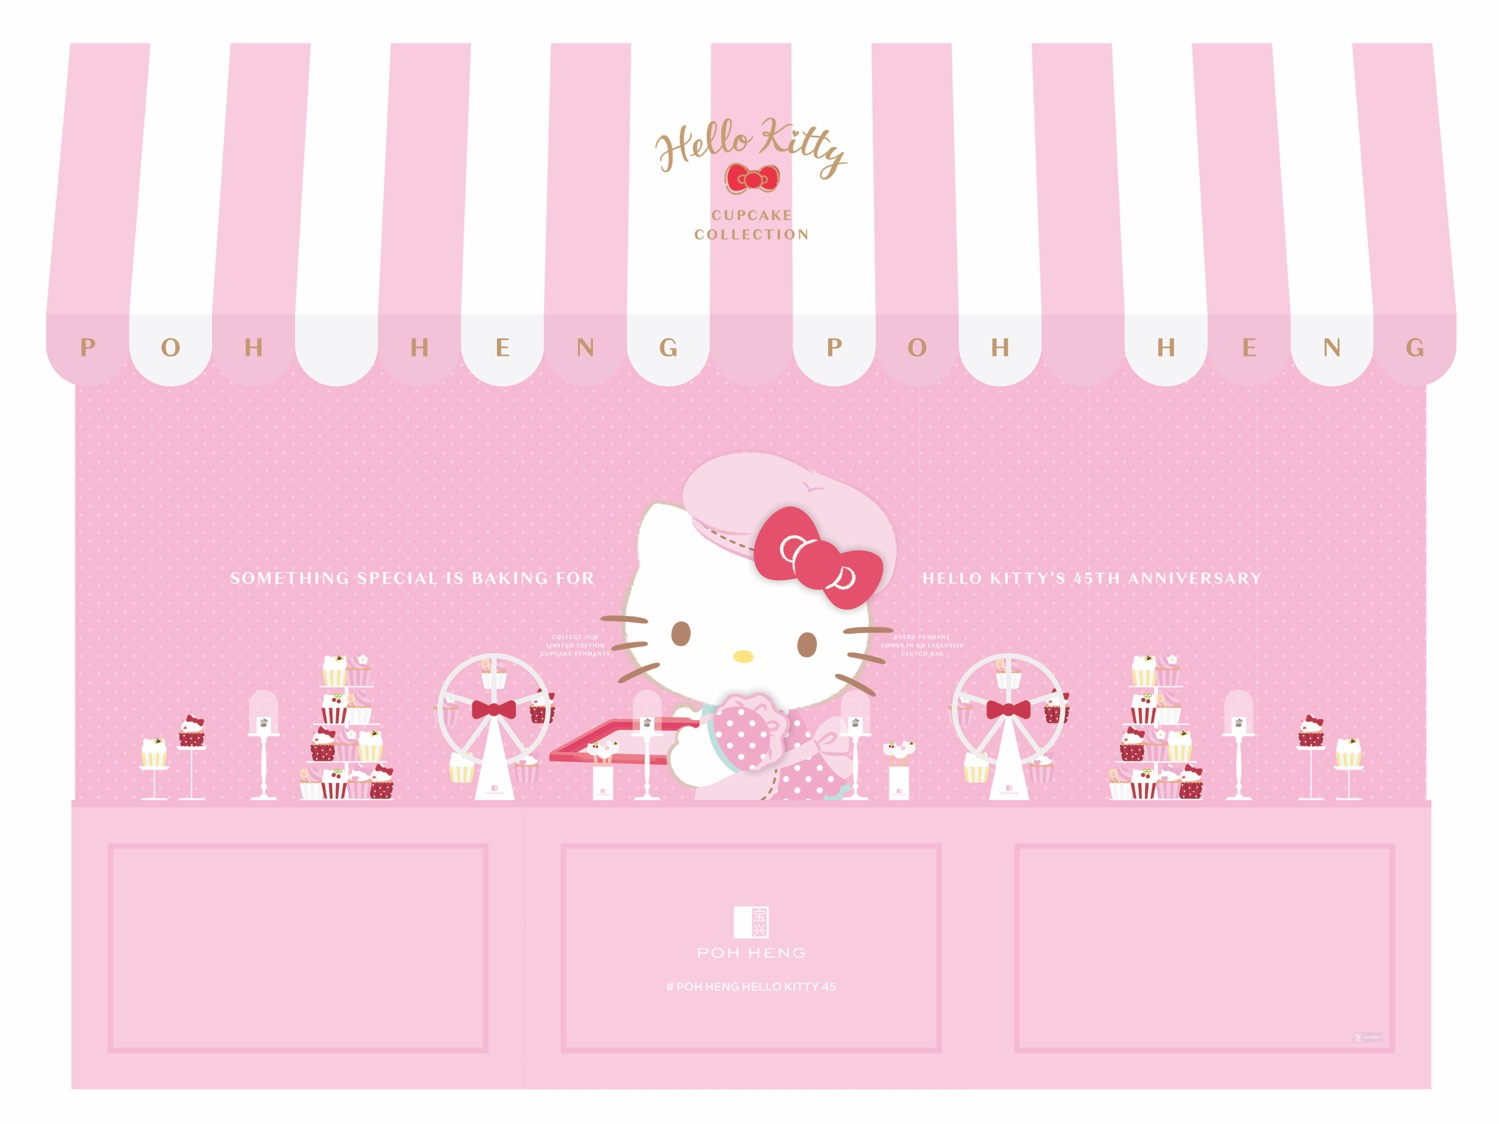 Poh Heng Hello Kitty Bakery Honeycombers Singapore